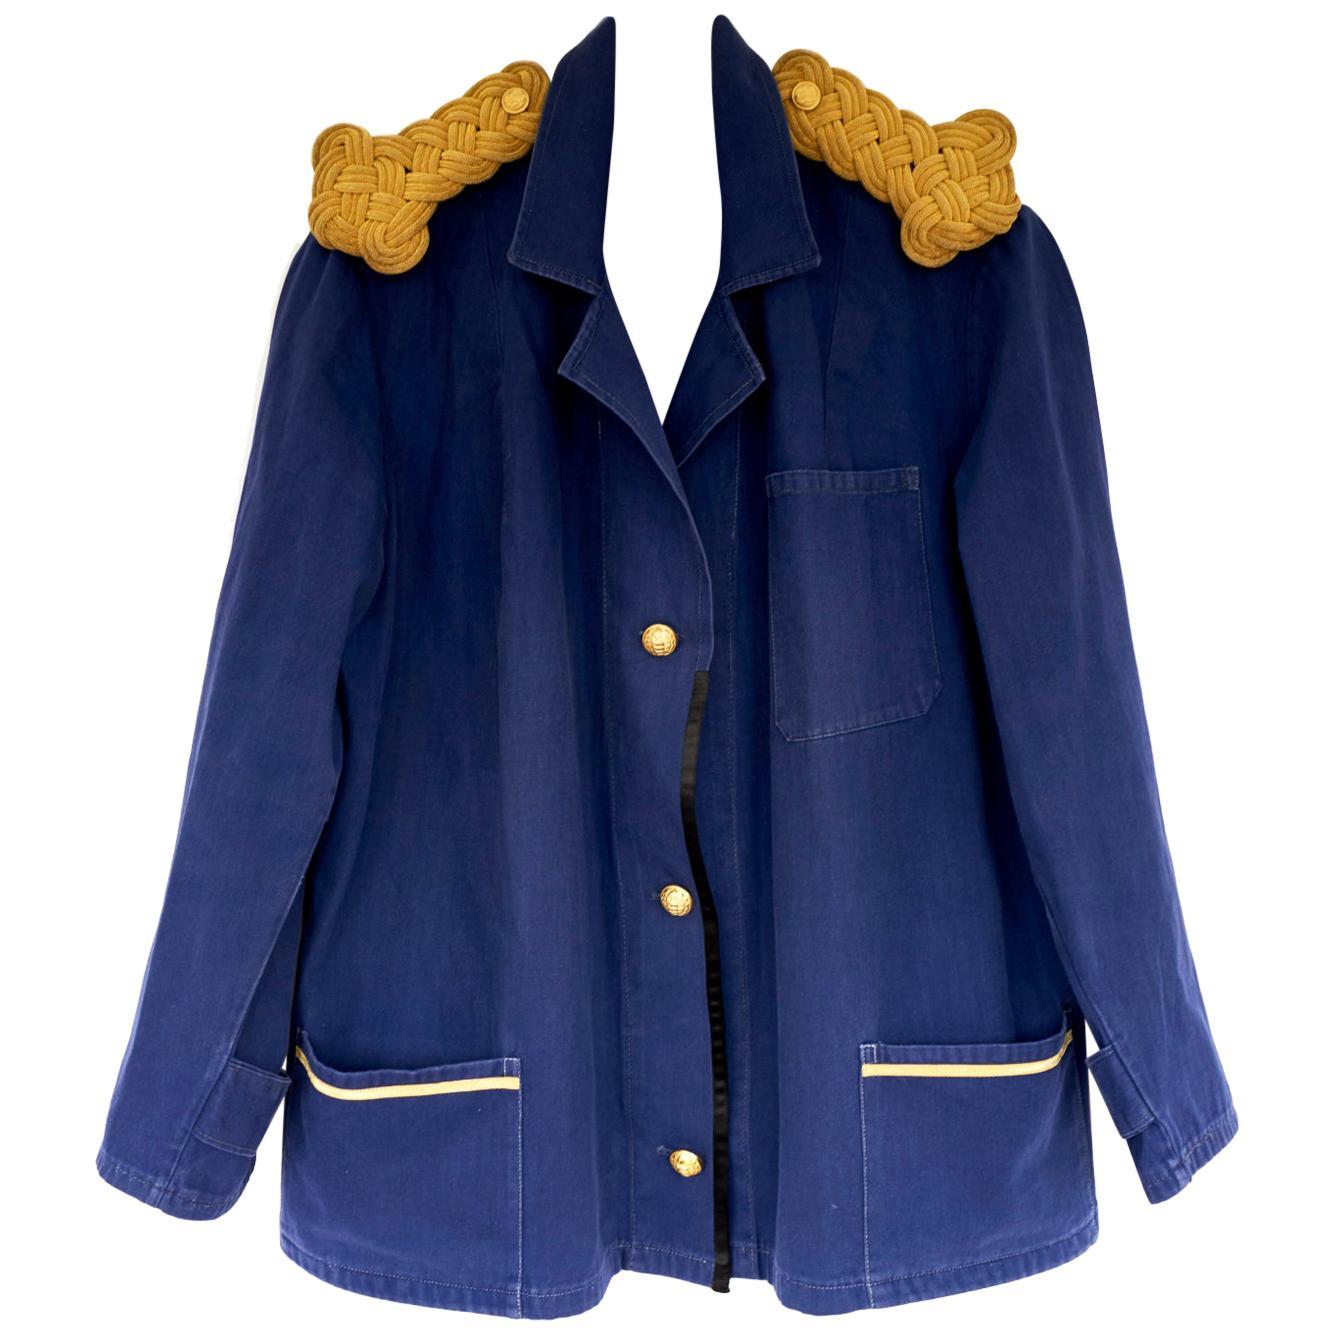 Blazer Jacket Sailor Embellished Epaulettes French Blue One of a kind J Dauphin